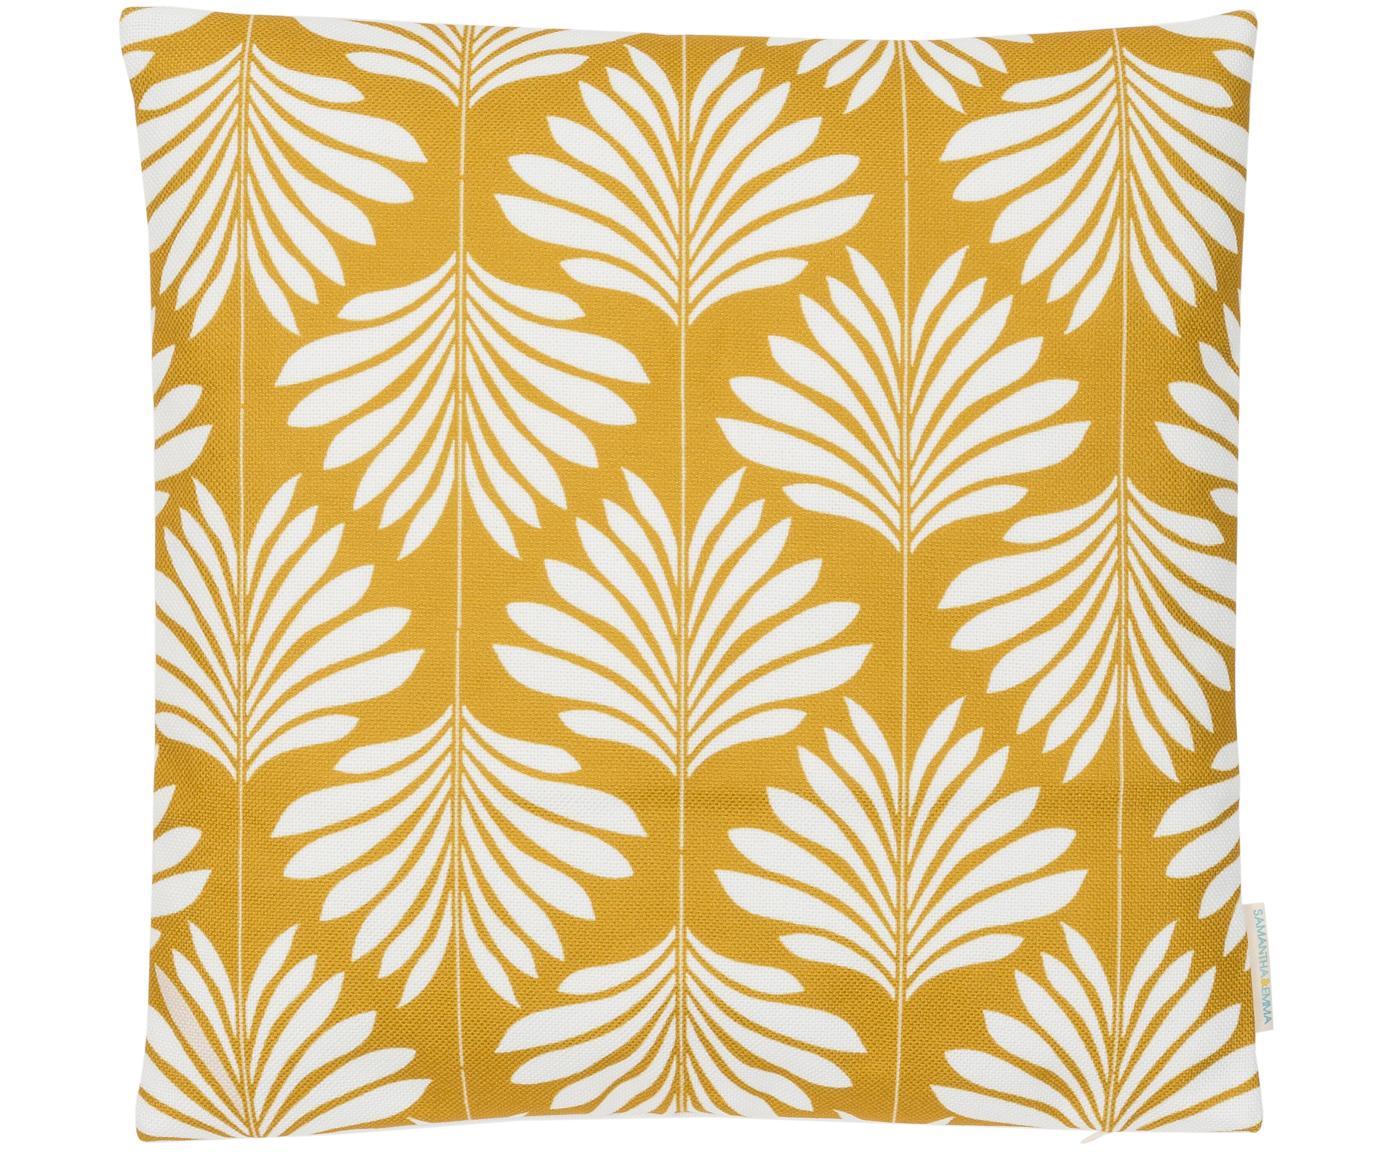 Funda de cojín de lino Agga, 60%lino, 40%algodón, Amarillo, blanco, An 45 x L 45 cm